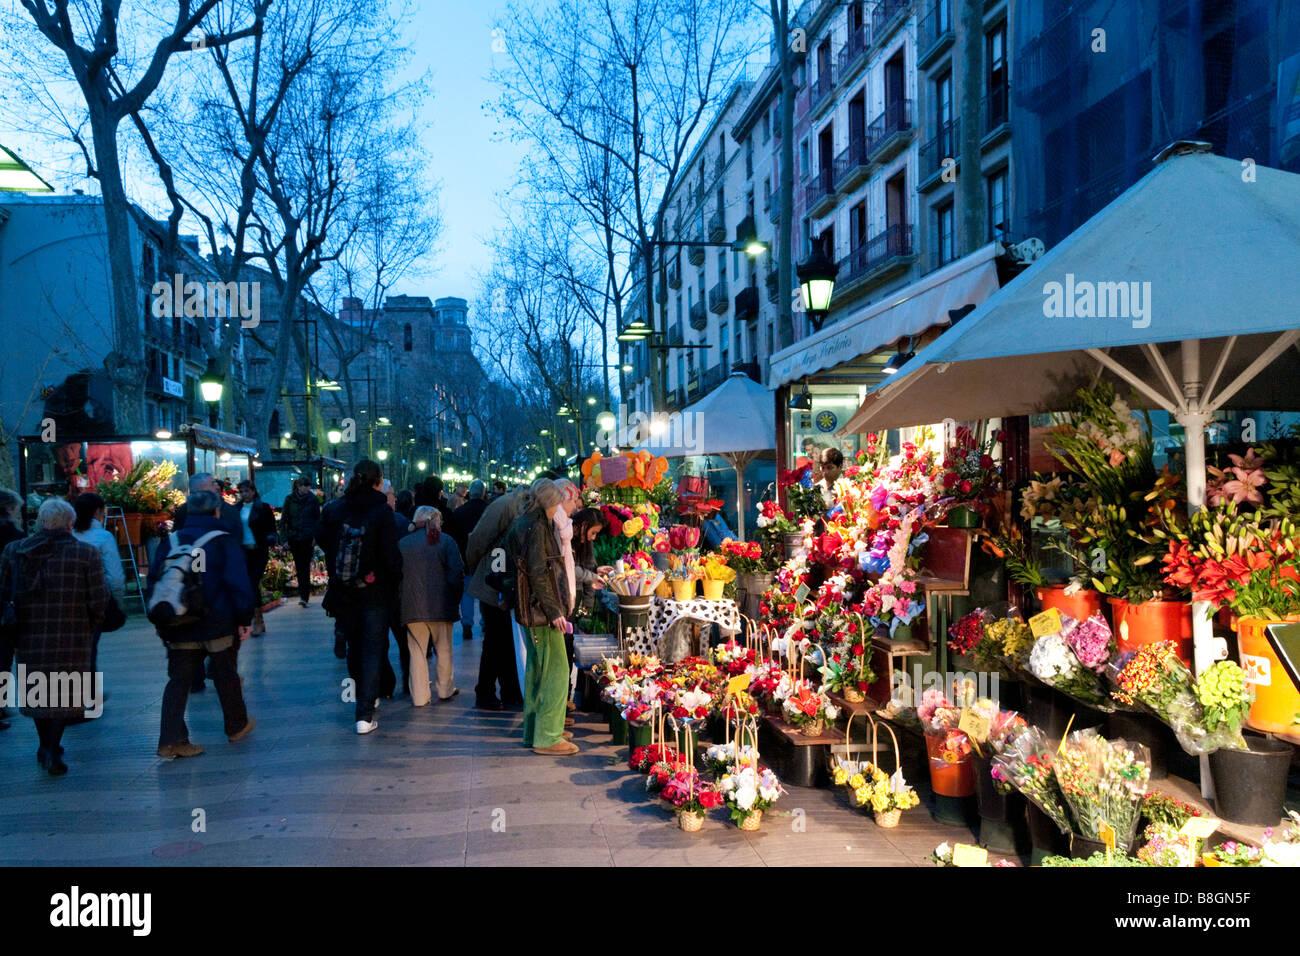 Flower stall on La Rambla, Barcelona, Spain - Stock Image